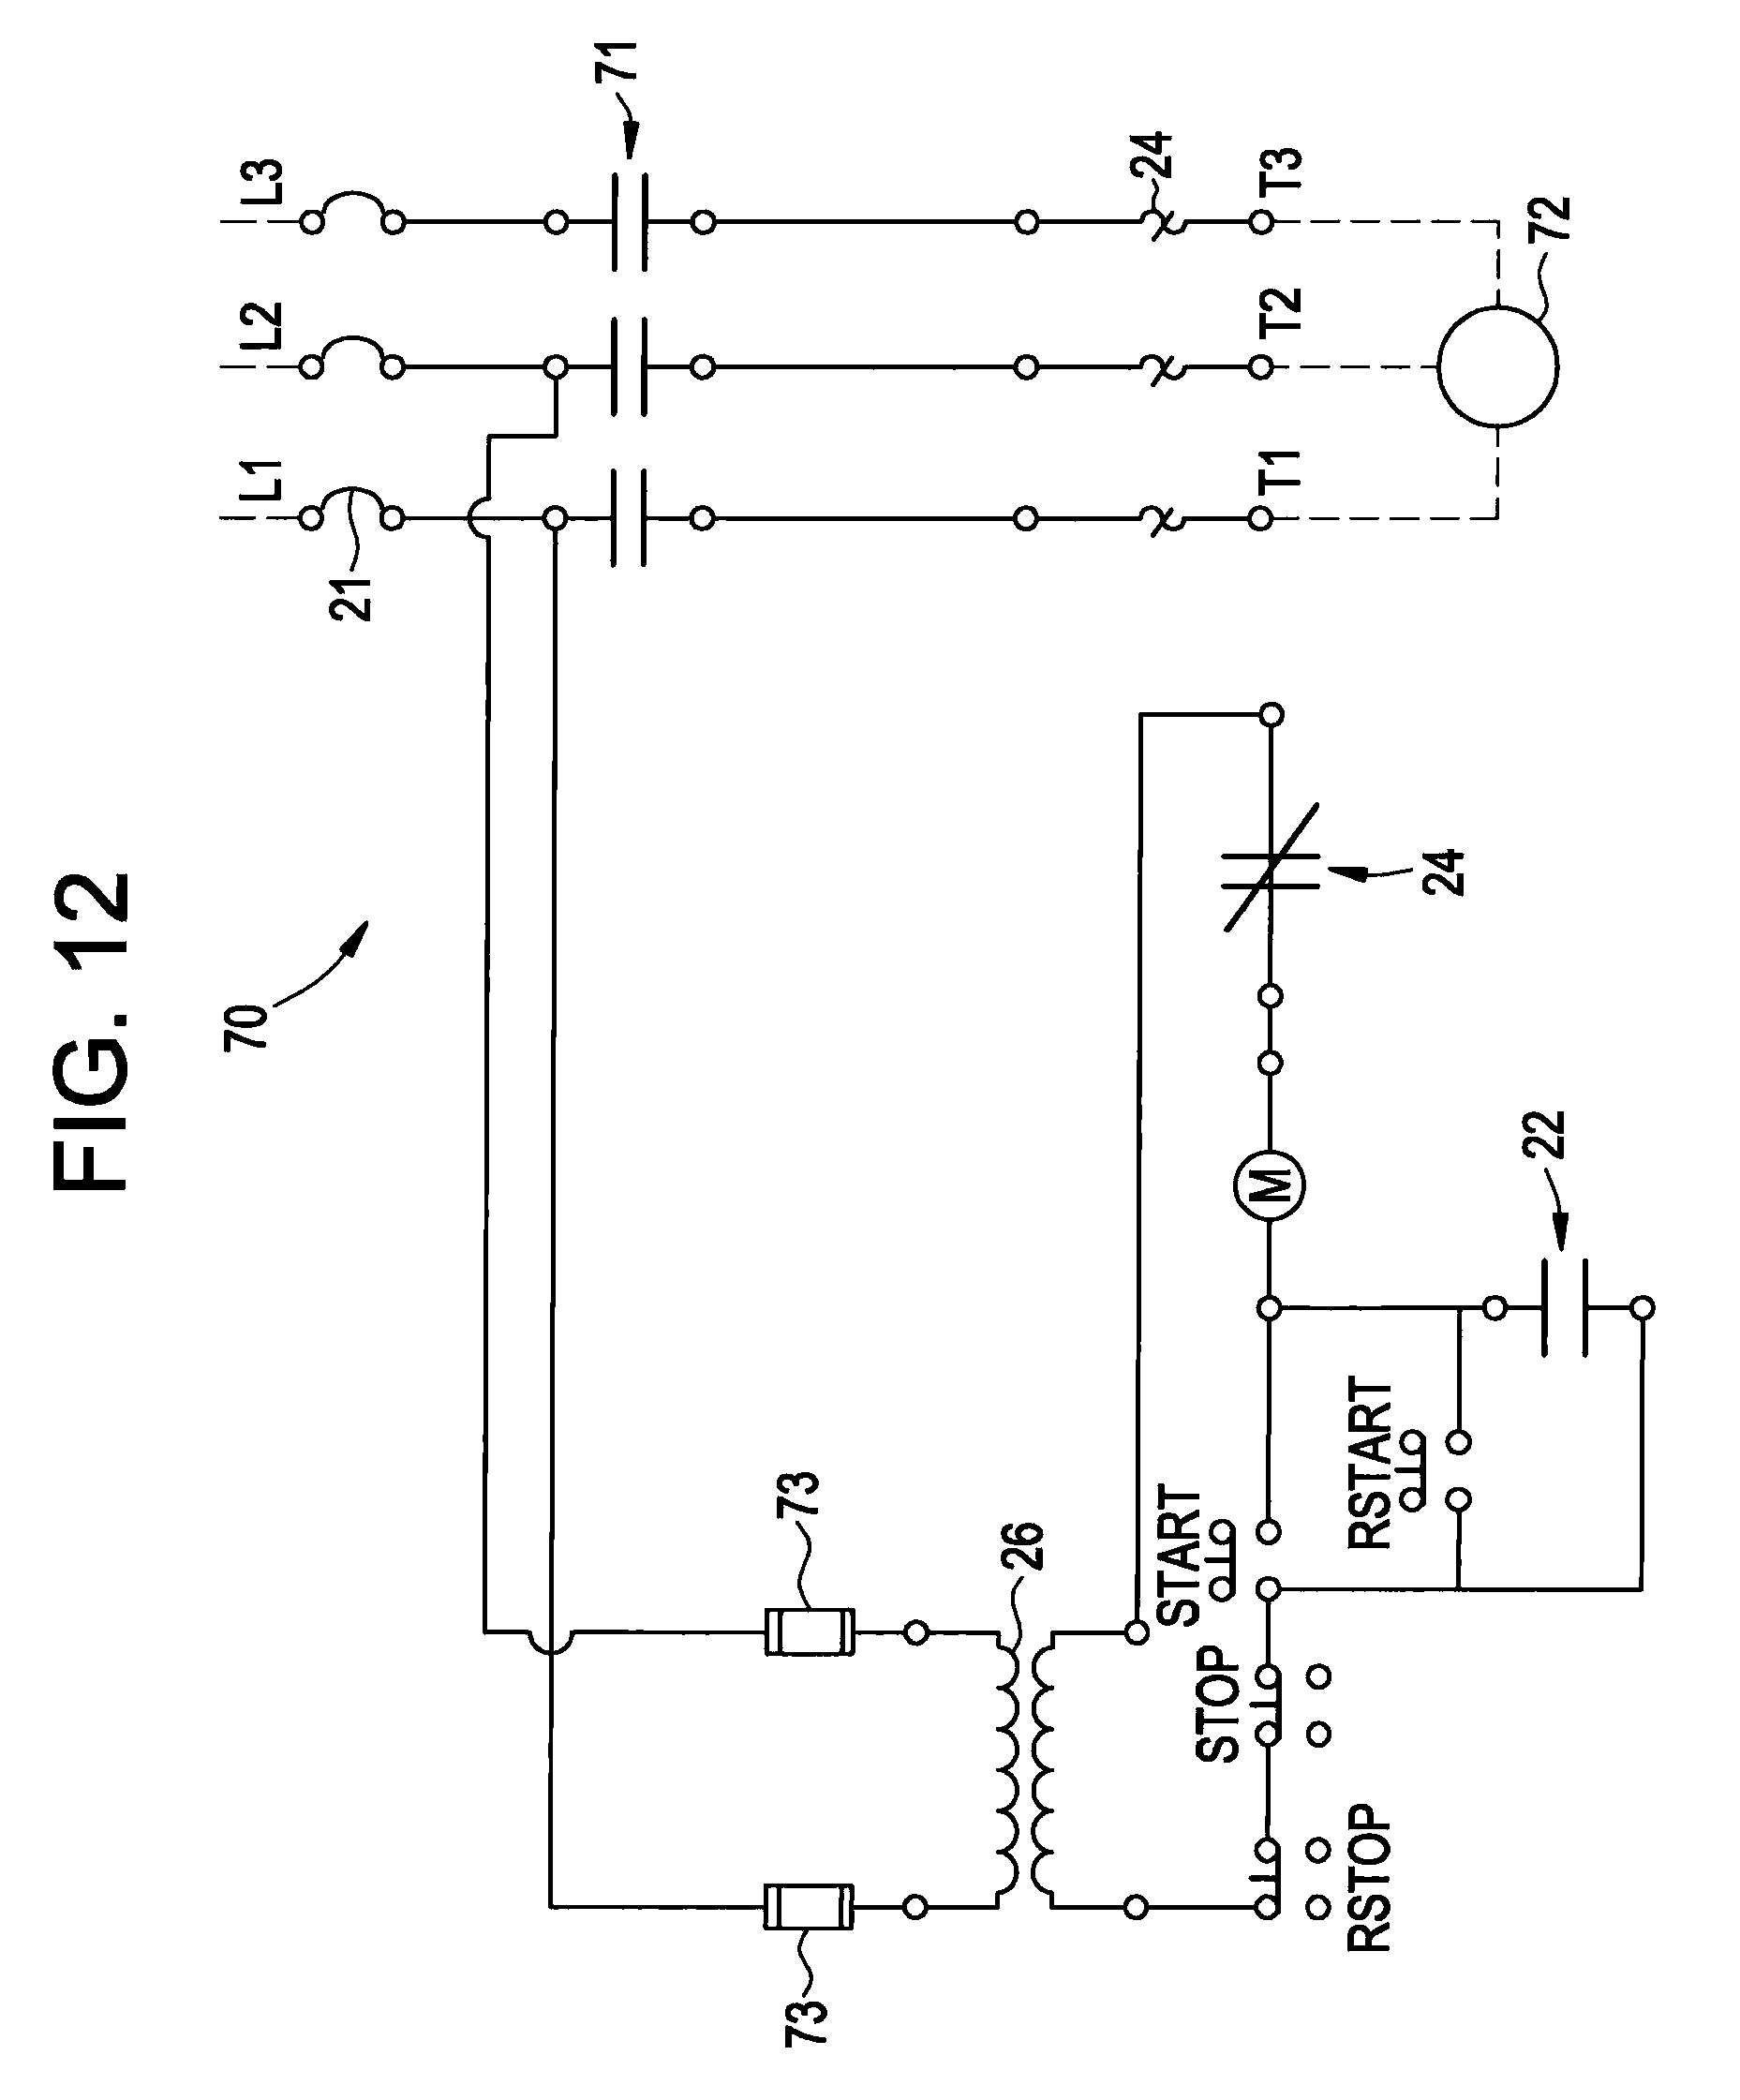 ttltomos logic converter circuit diagram tradeoficcom blog wiring cat5ewiringdiagramcat5ewiringstandardcat5ewiringdiagram [ 1857 x 2241 Pixel ]